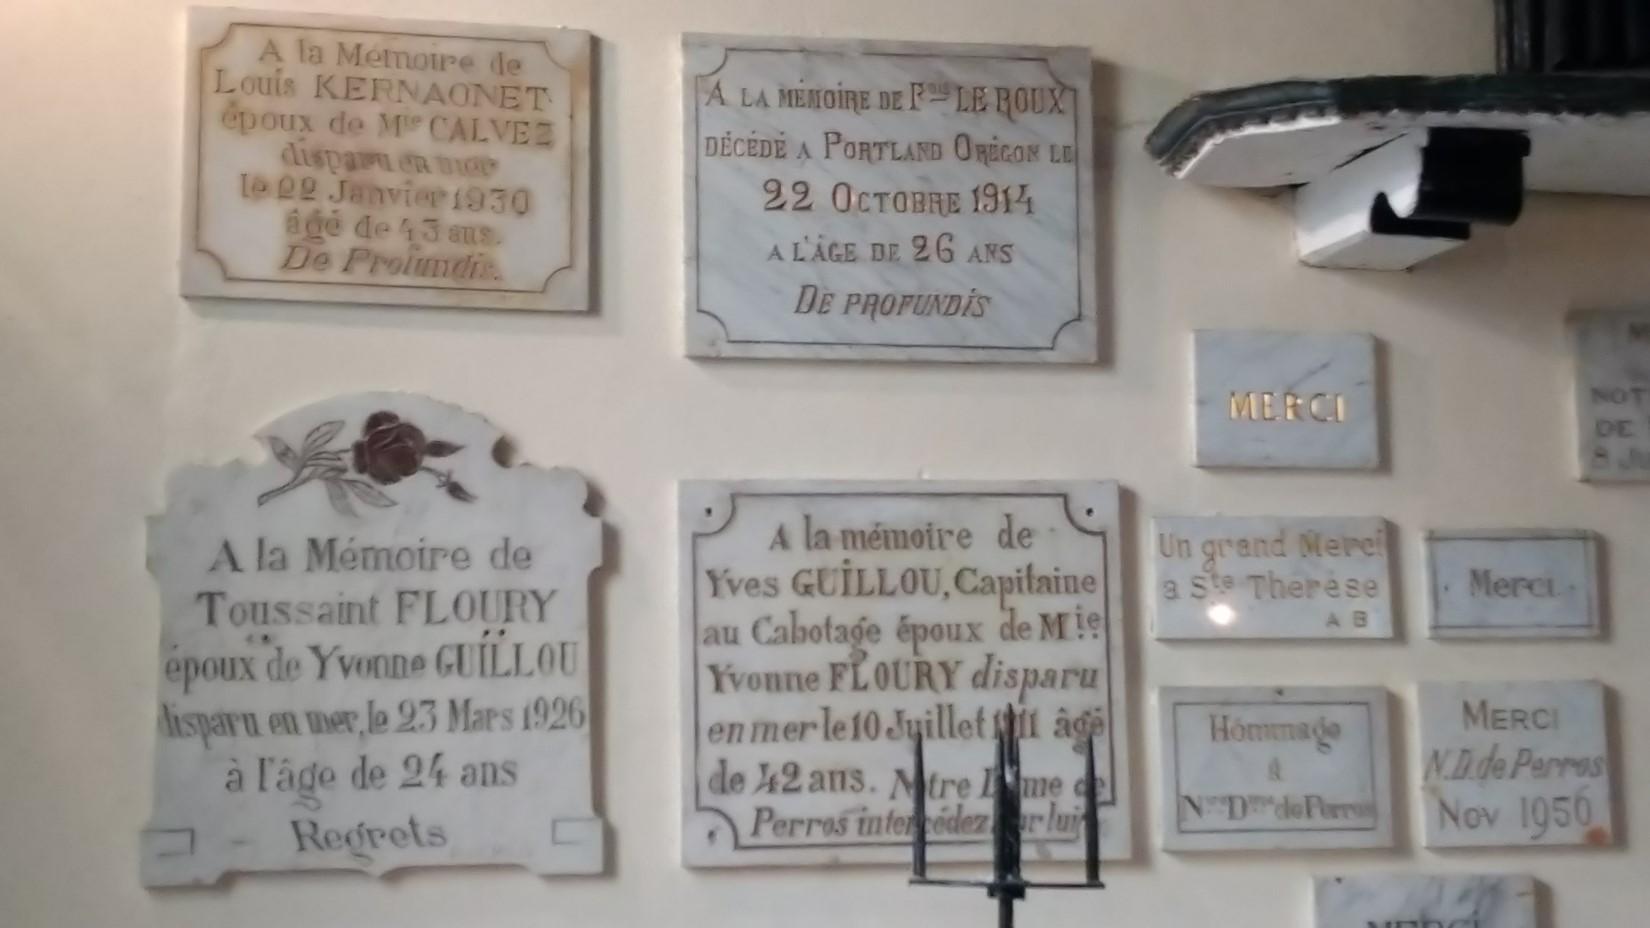 Chapelle_Perros-Hamon_plaques